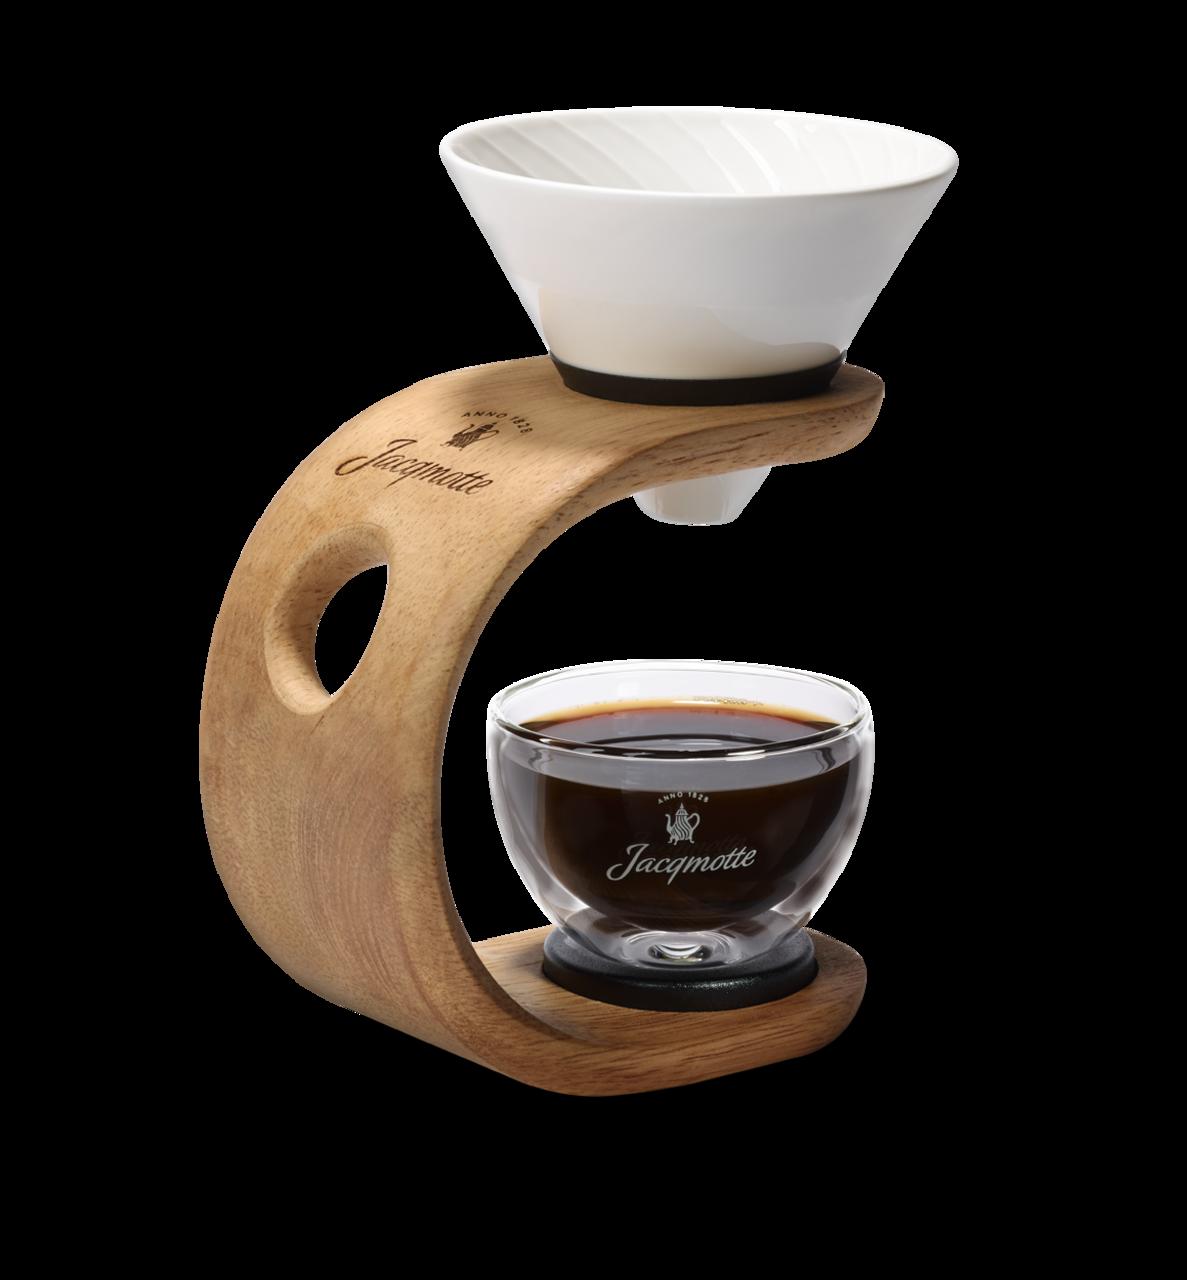 Best Coffee Maker On The Market